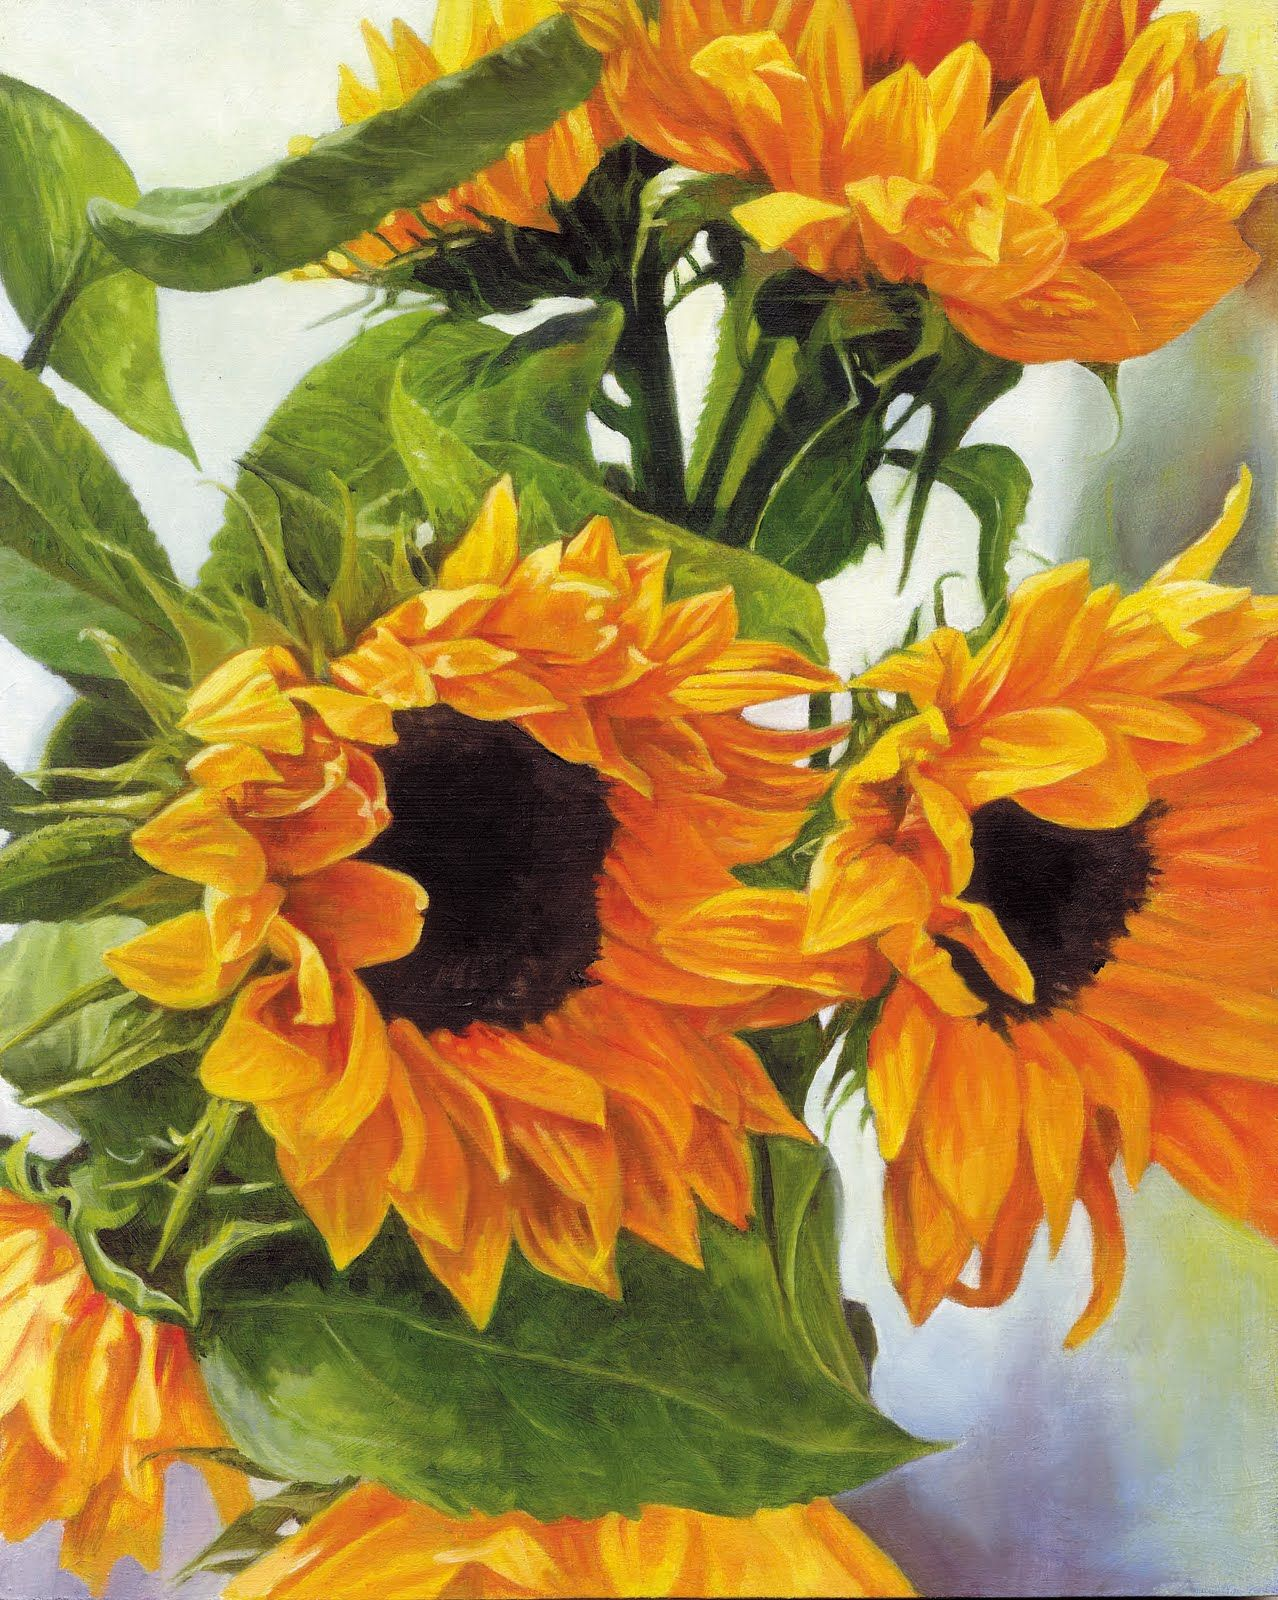 Sunflower Paintings Sunflowers Oil Painting On Board 8in X 10 In Sunflower Canvas Paintings Sunflower Painting Sunflower Art